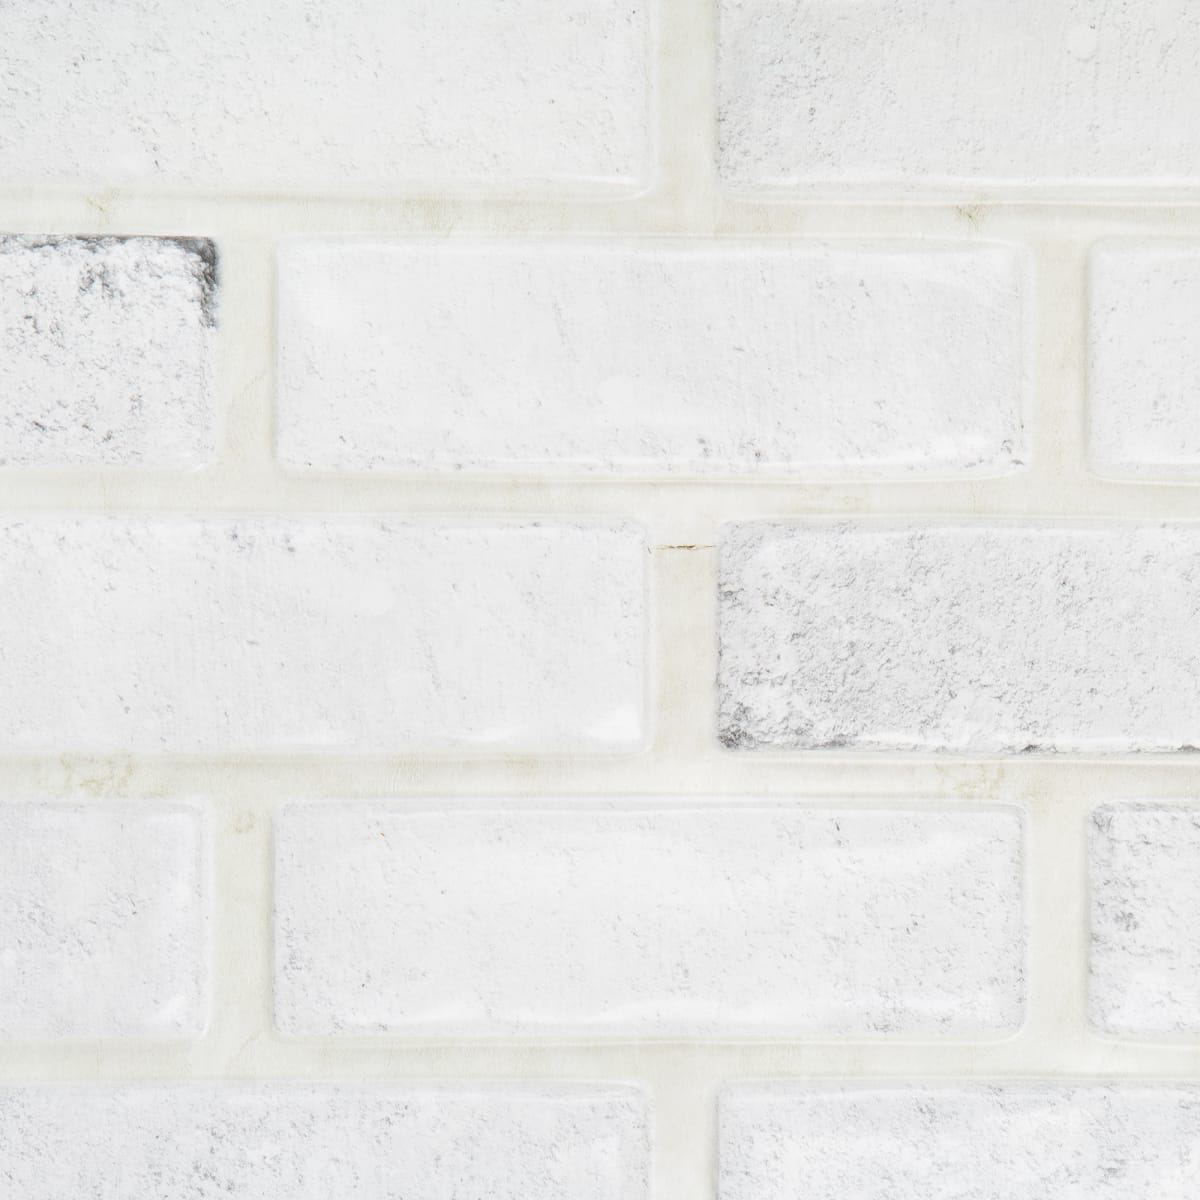 Панель ПВХ листовая 3 мм 960х485 мм Камень белый 0.47 м²